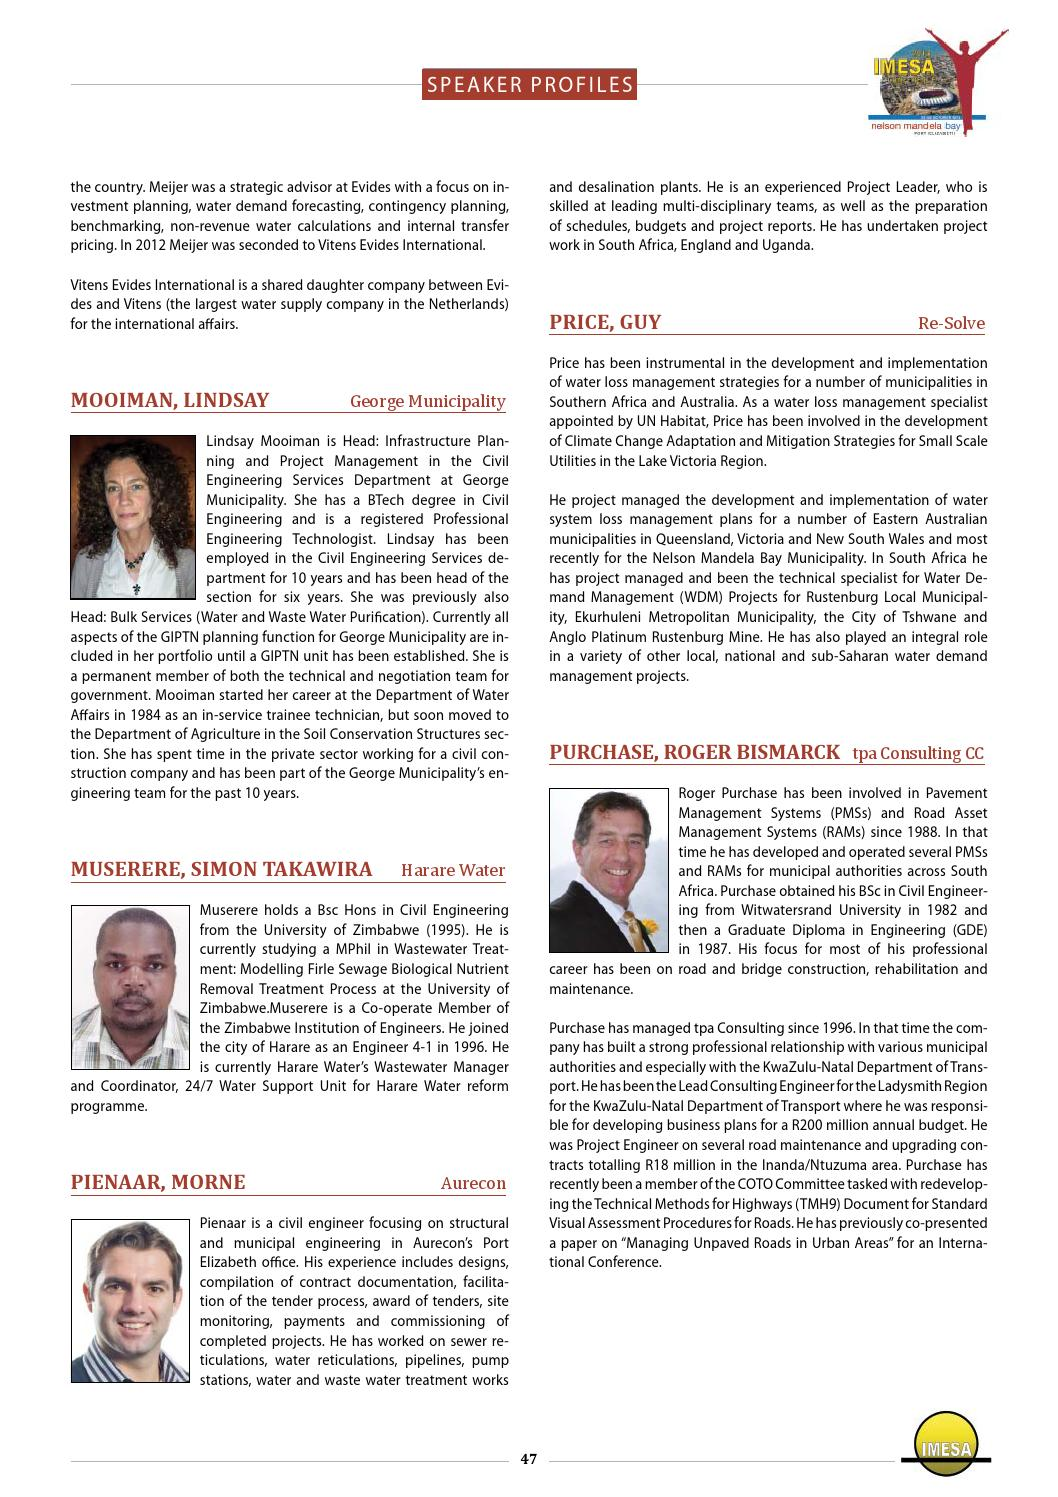 Imesa conference proceedings 2013